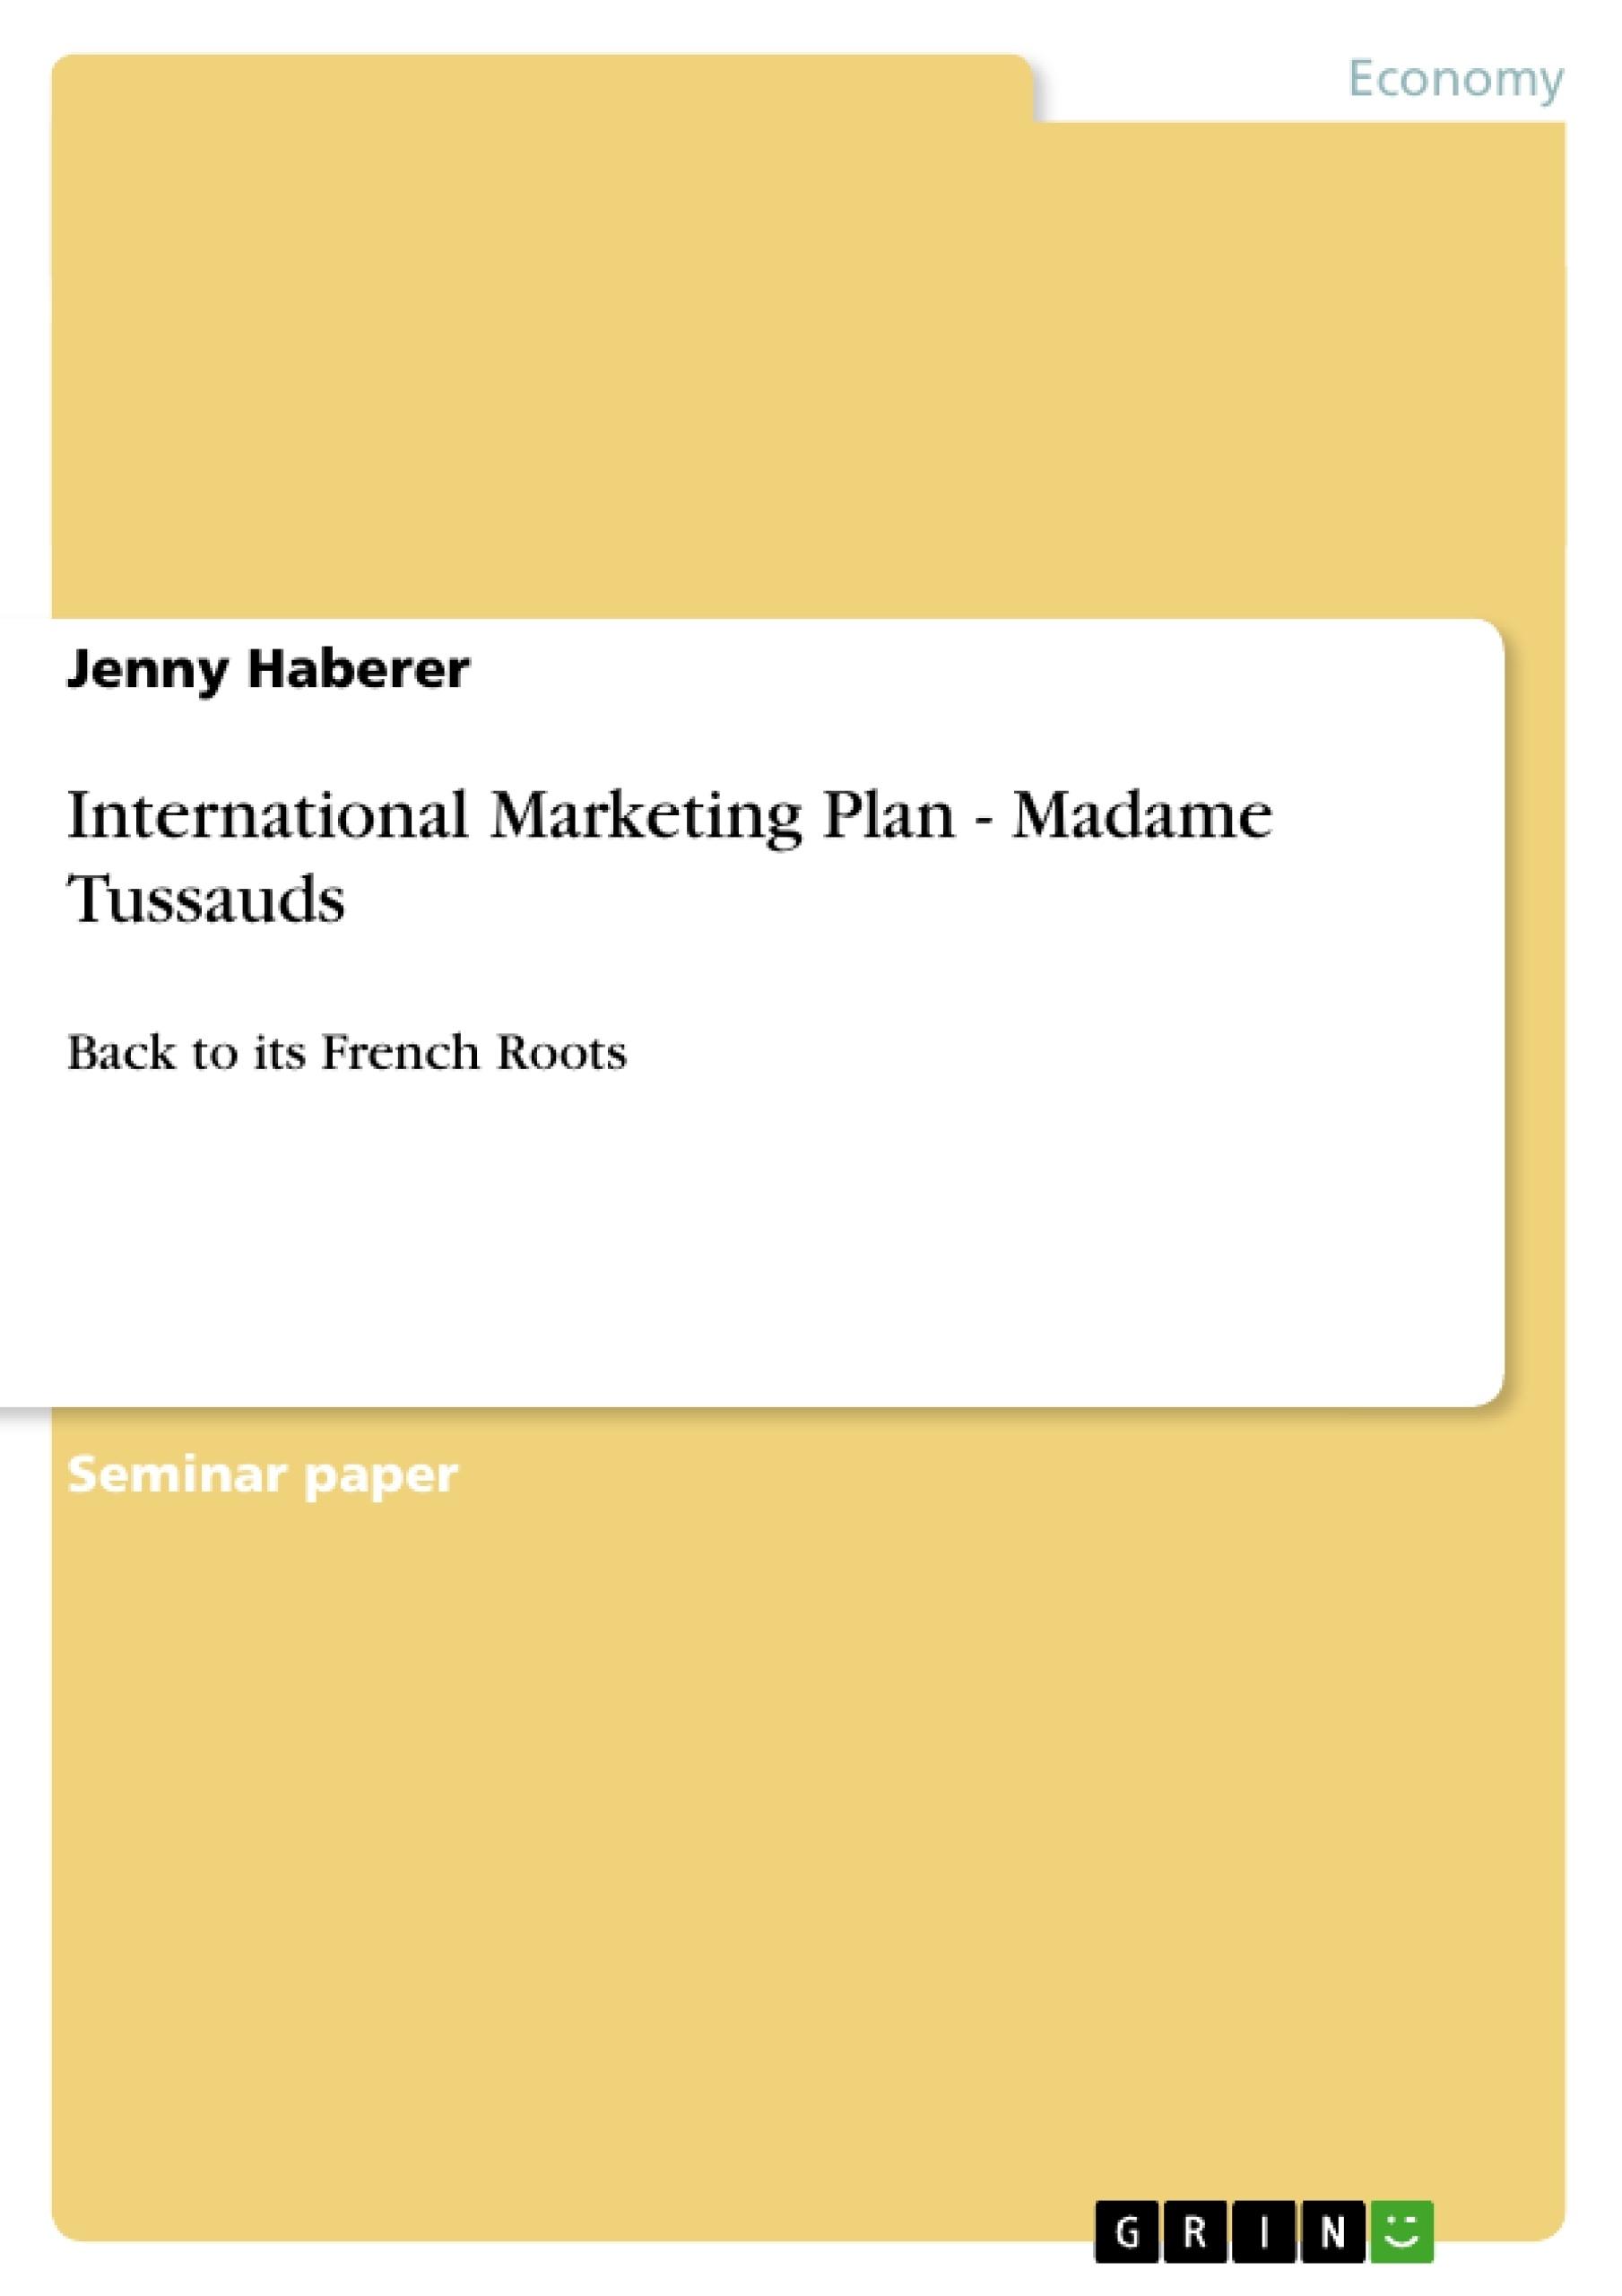 Title: International Marketing Plan - Madame Tussauds